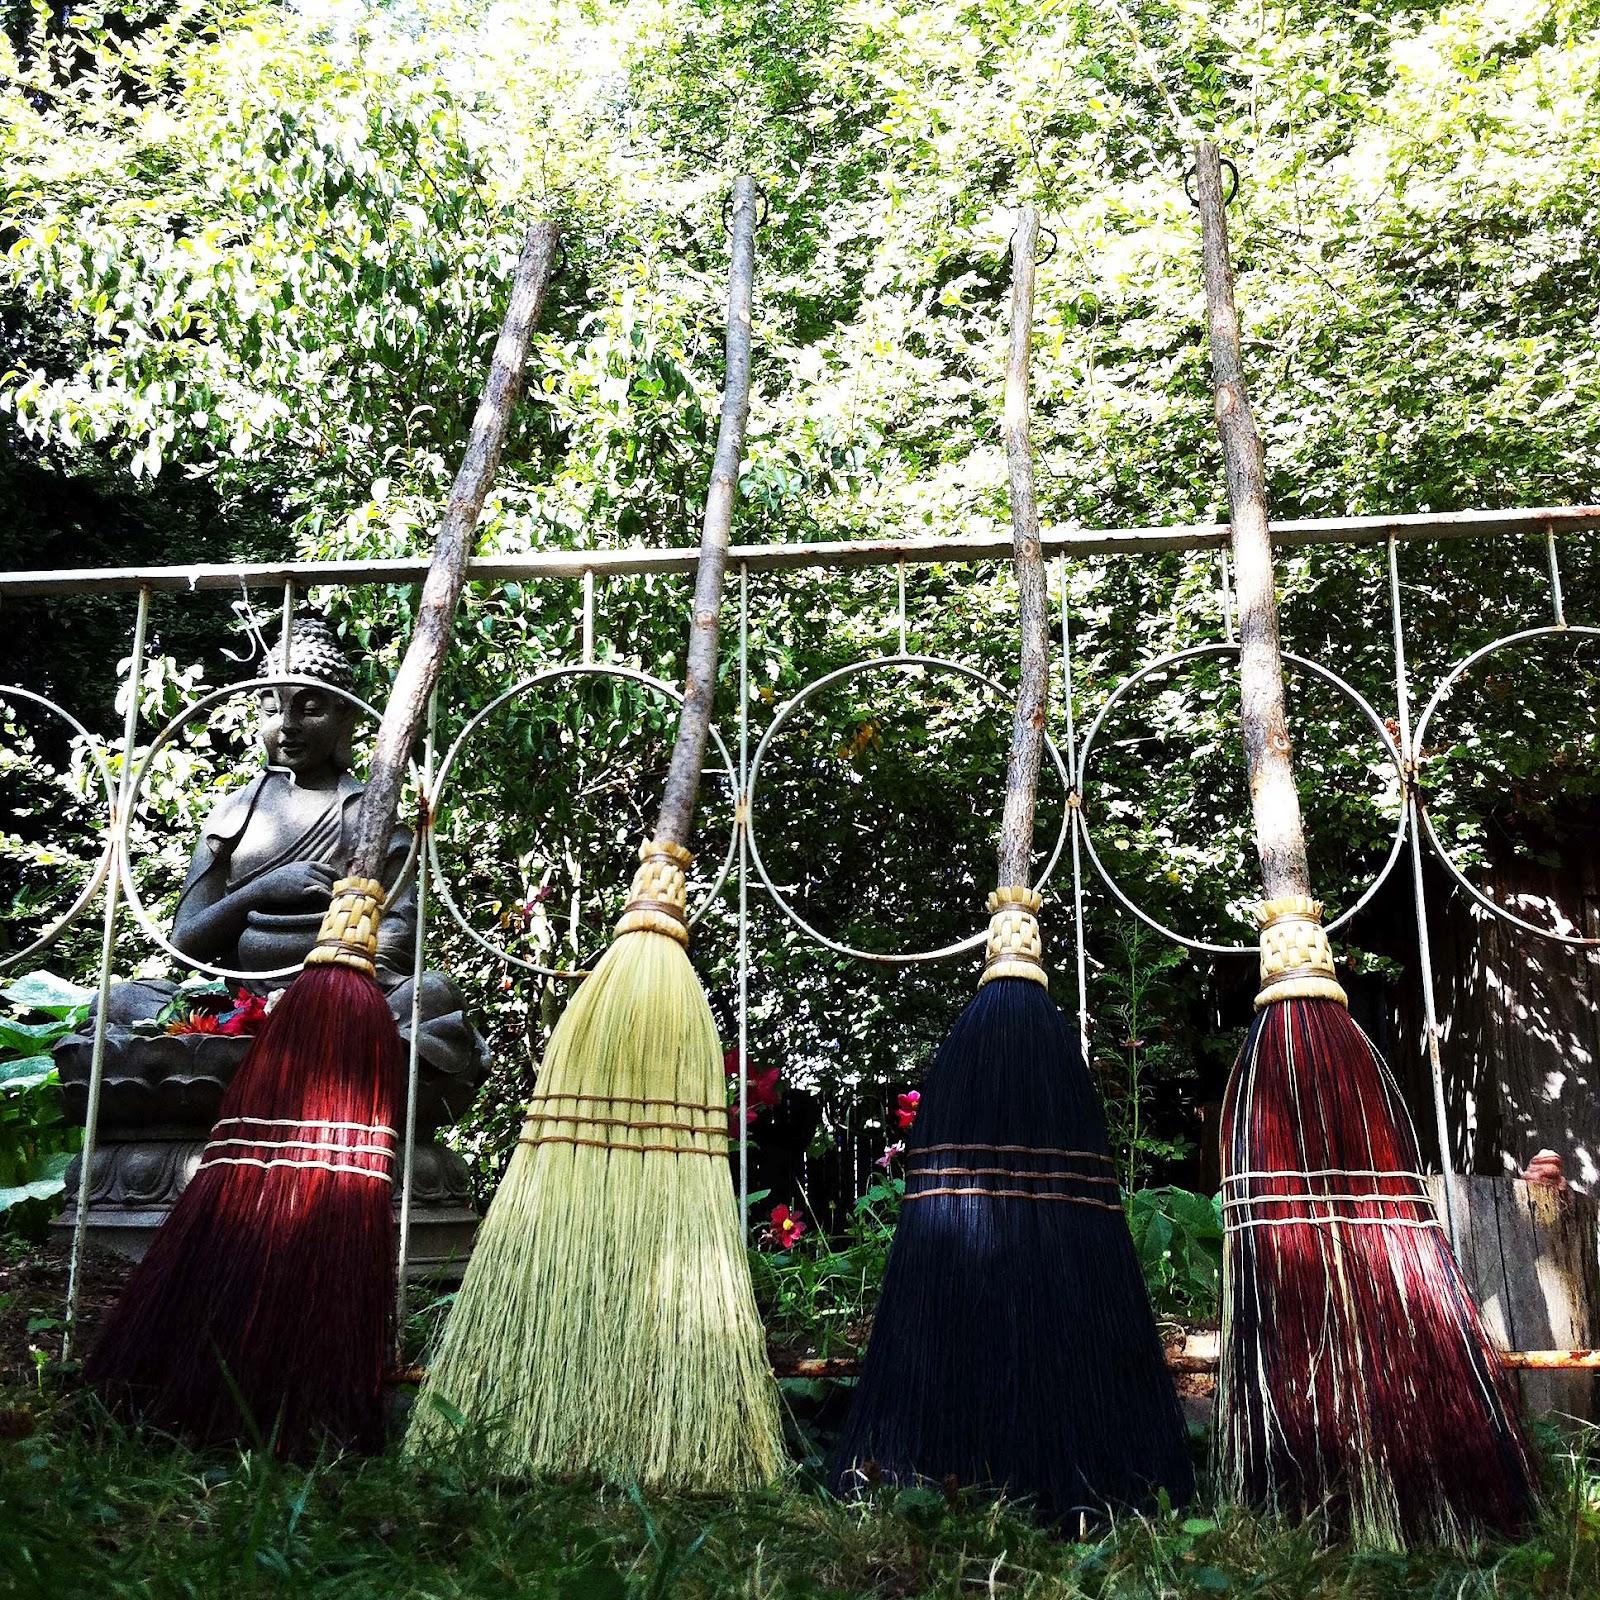 wedding brooms and handfasting besoms wedding brooms Wedding Brooms and Handfasting Besoms